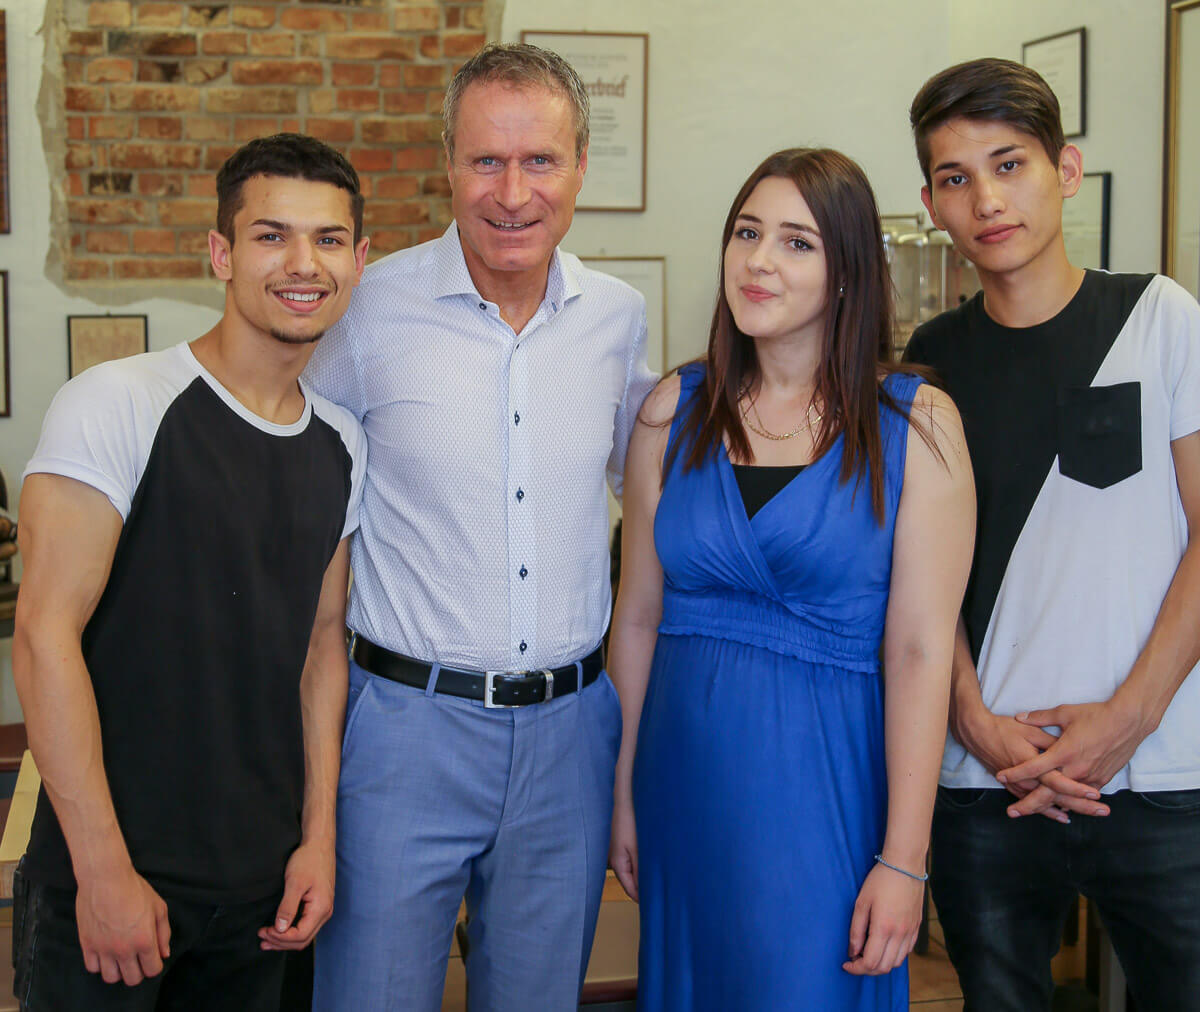 Friseurmeister Daniel Schmid mit den neuen Azubis: Stojan Siscovic, Polymnia Ioannidis und Hassan Rezai